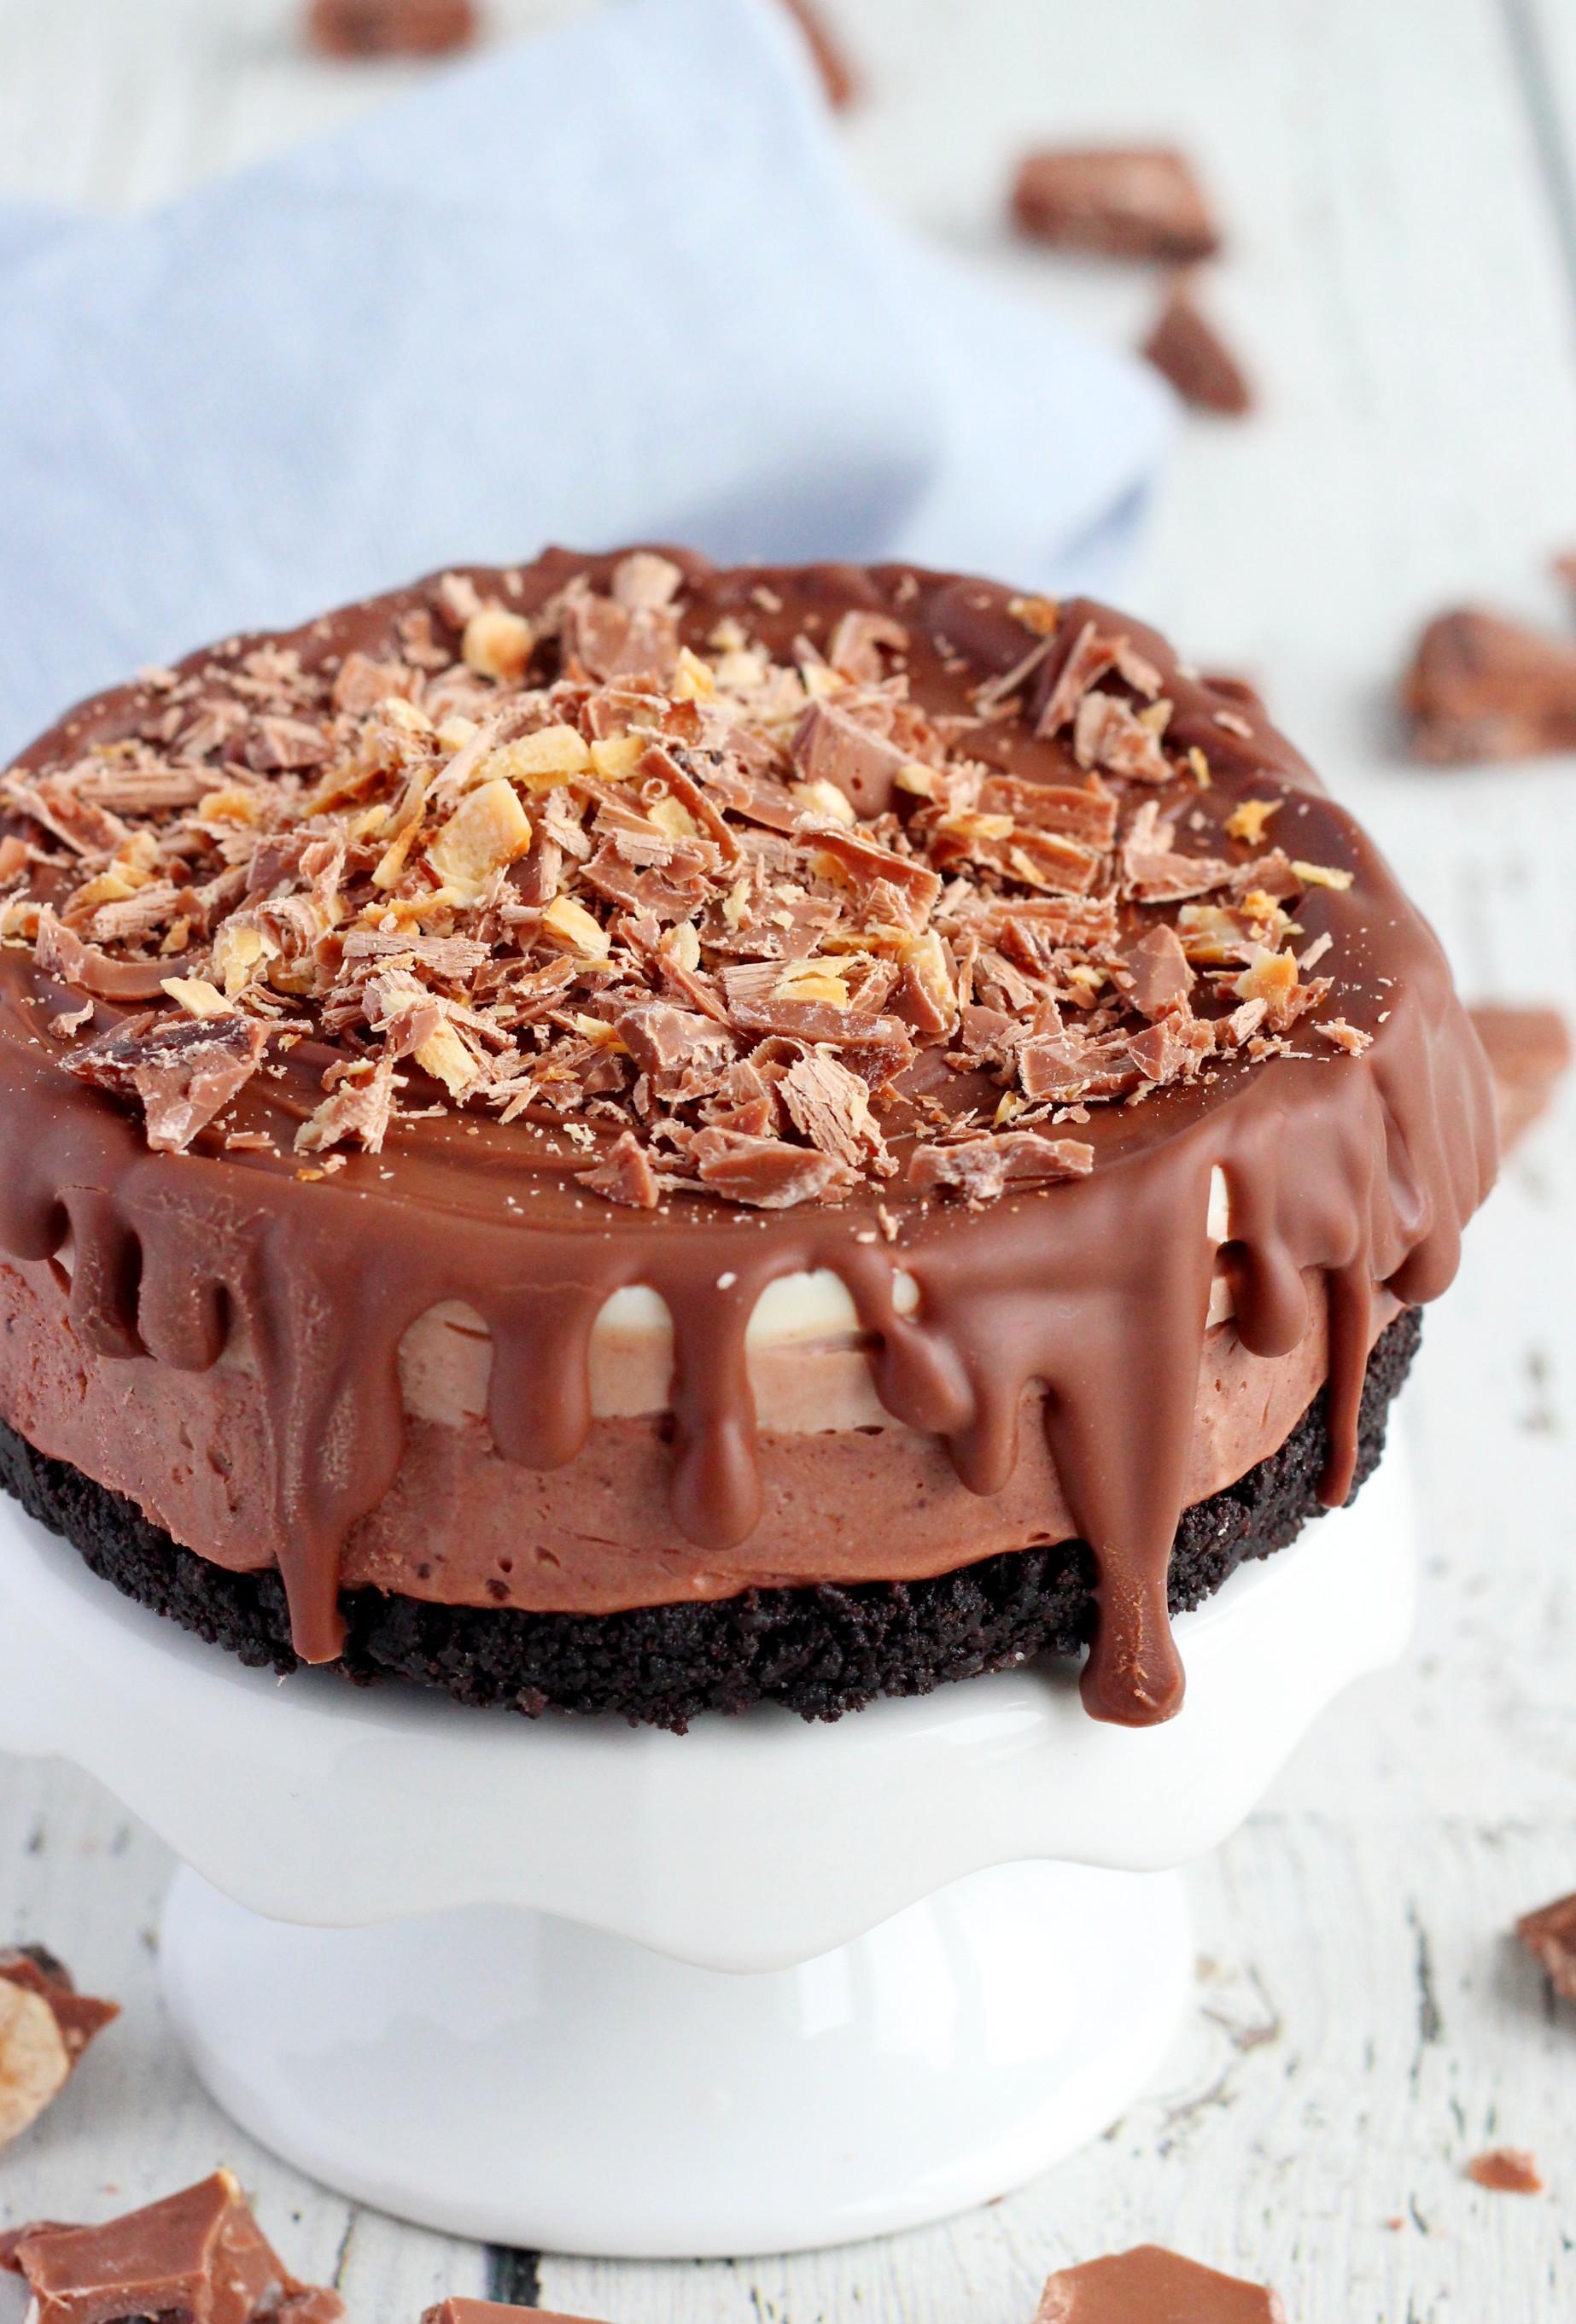 Triple chocolate cheesecake on cake stand